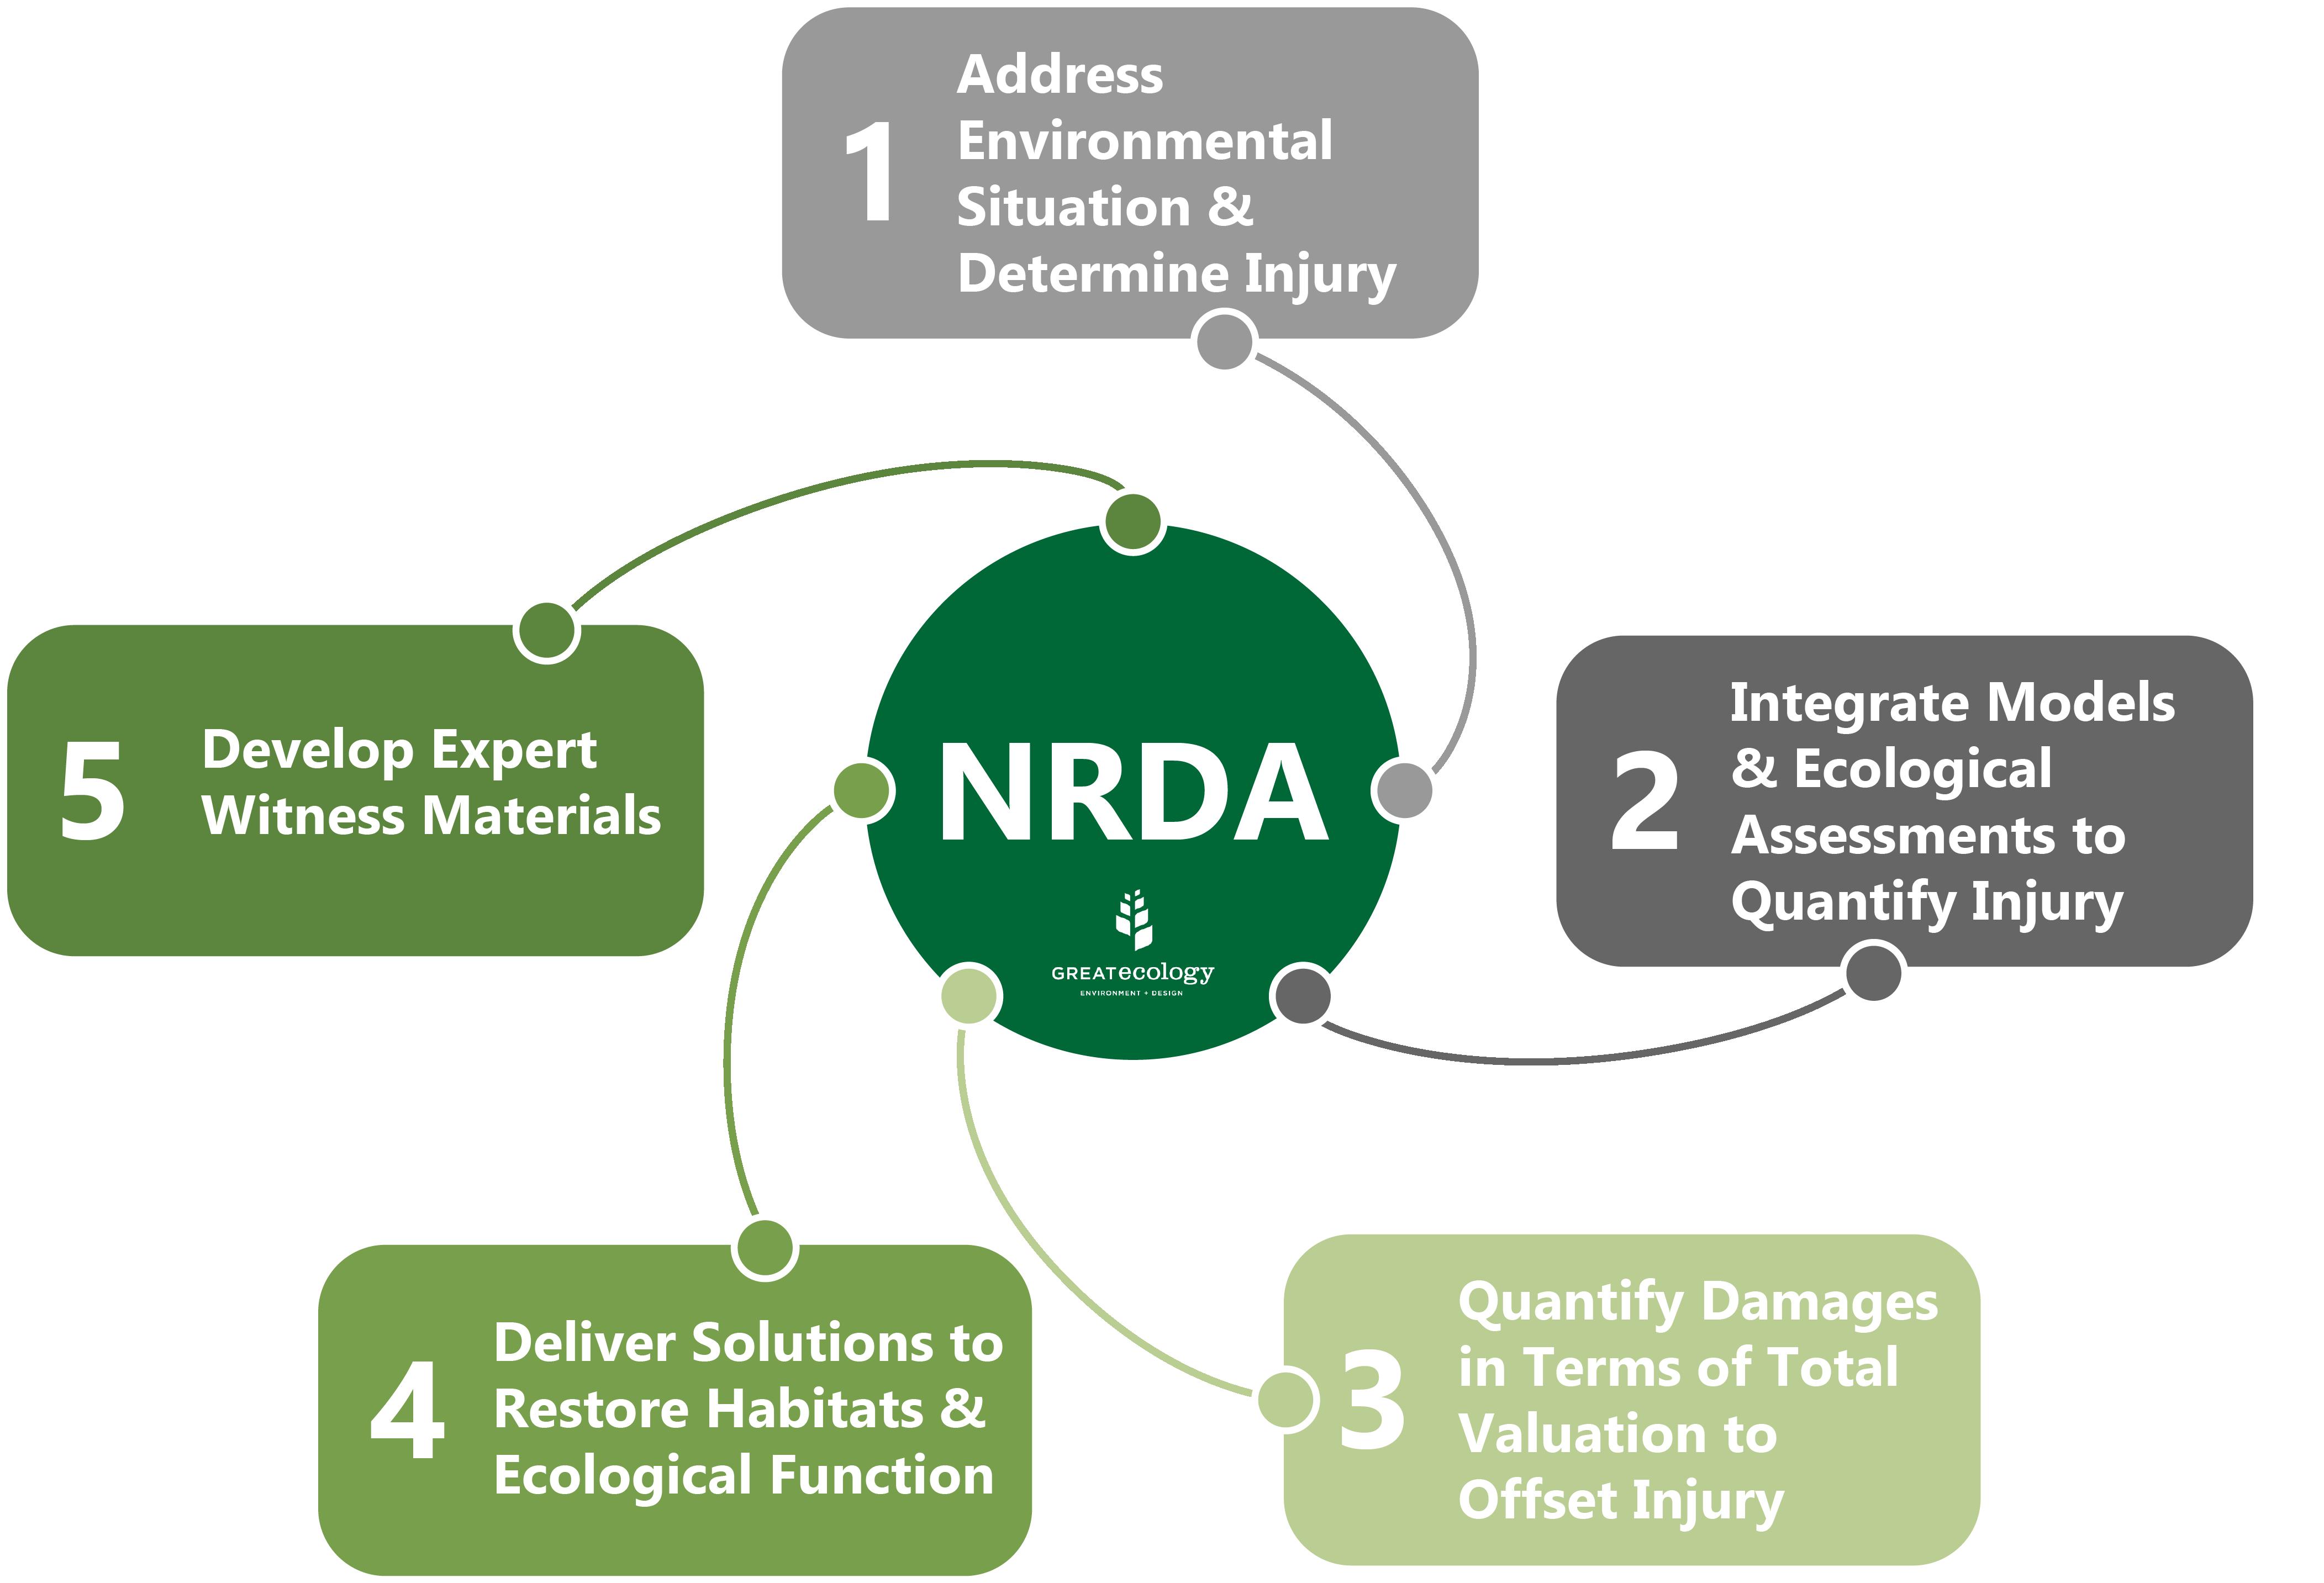 Great Ecology's NRDA Process